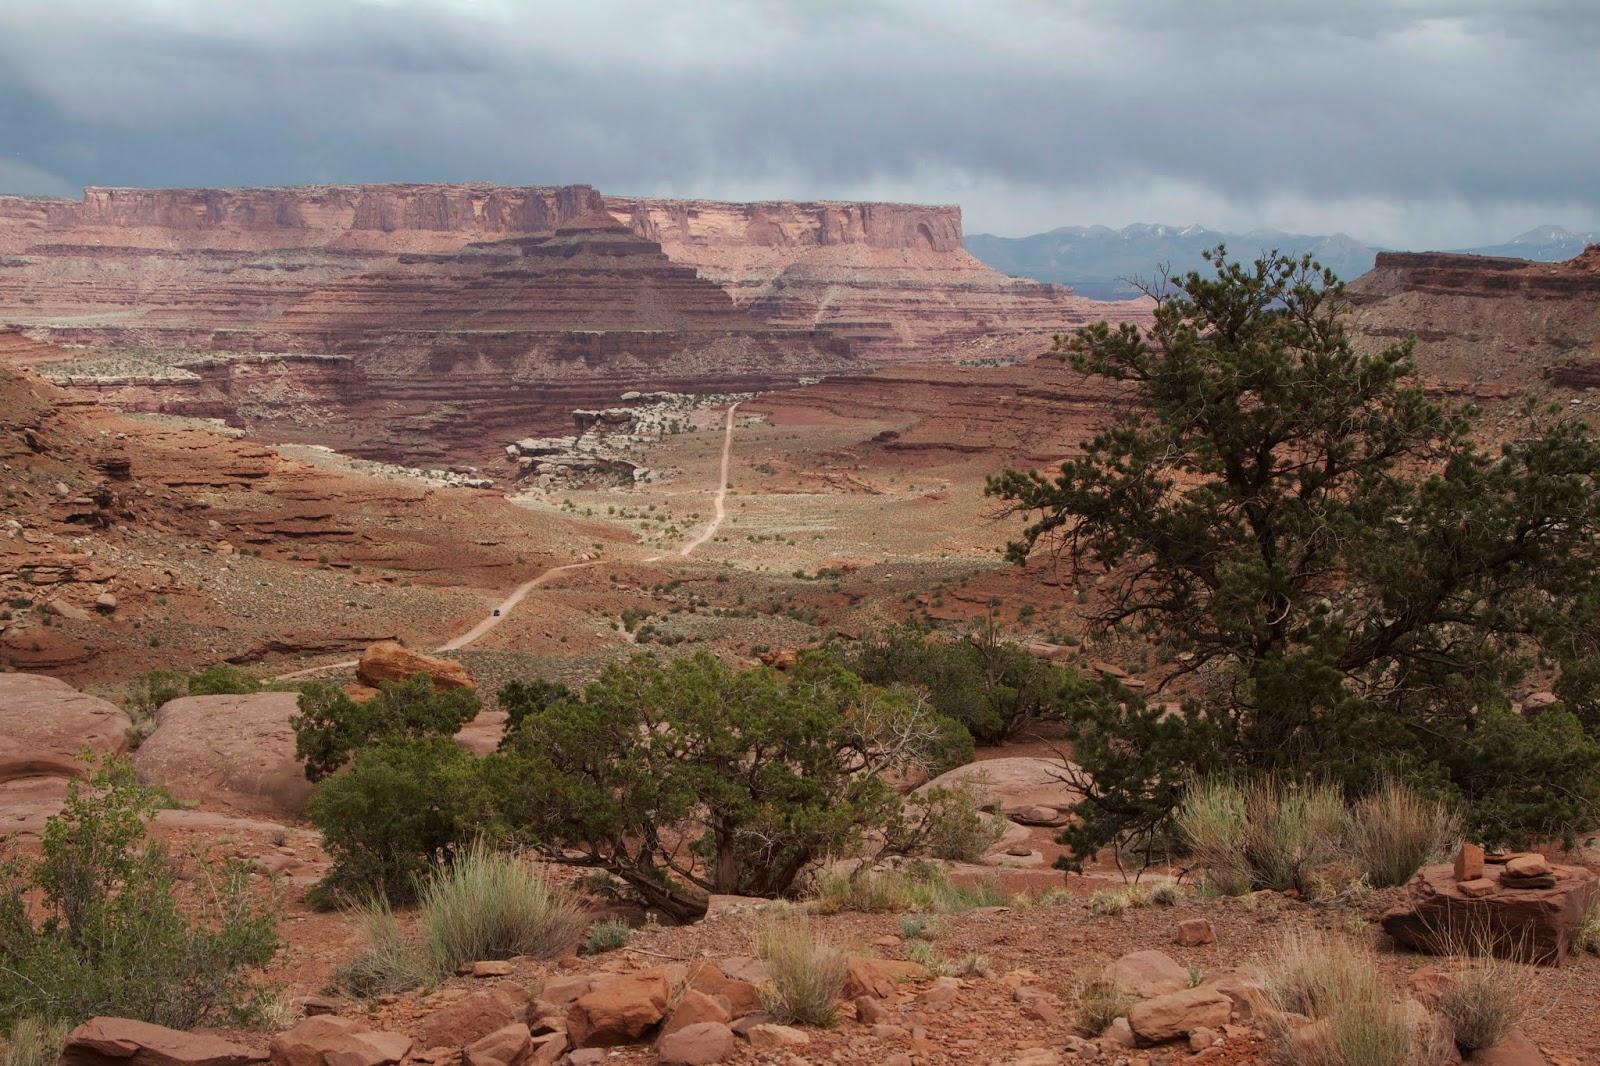 Canyonlands National Park: The White Rim Redux